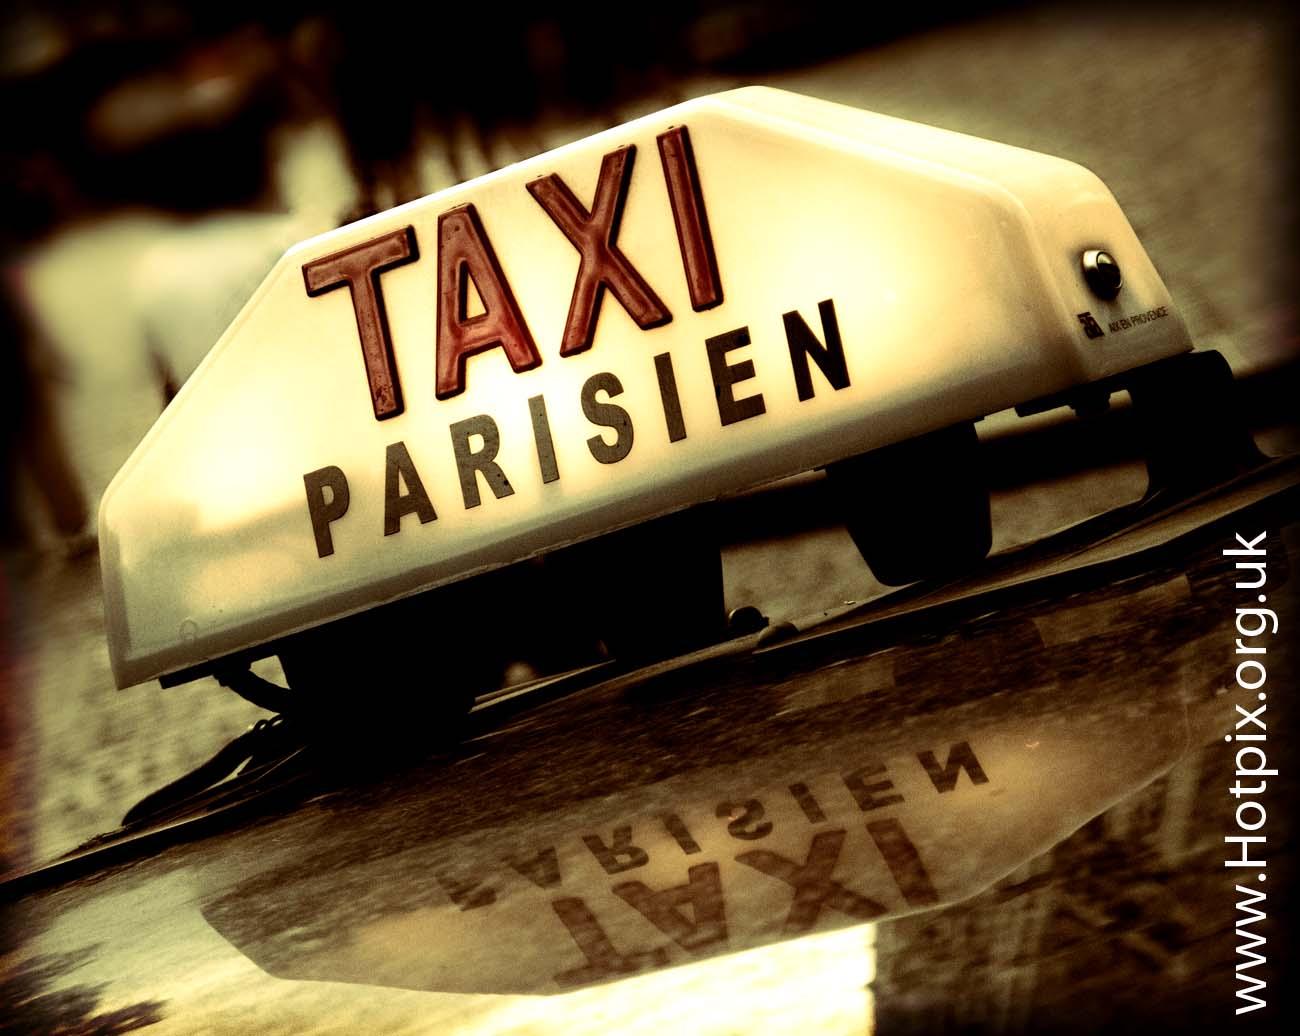 taxi,paris,france,parisien,taxiparisien,tonysmith,hotpix,europa,europe,sepia,selective,colour,street,rue,road,reflection,city,car,transport,voiture,sign